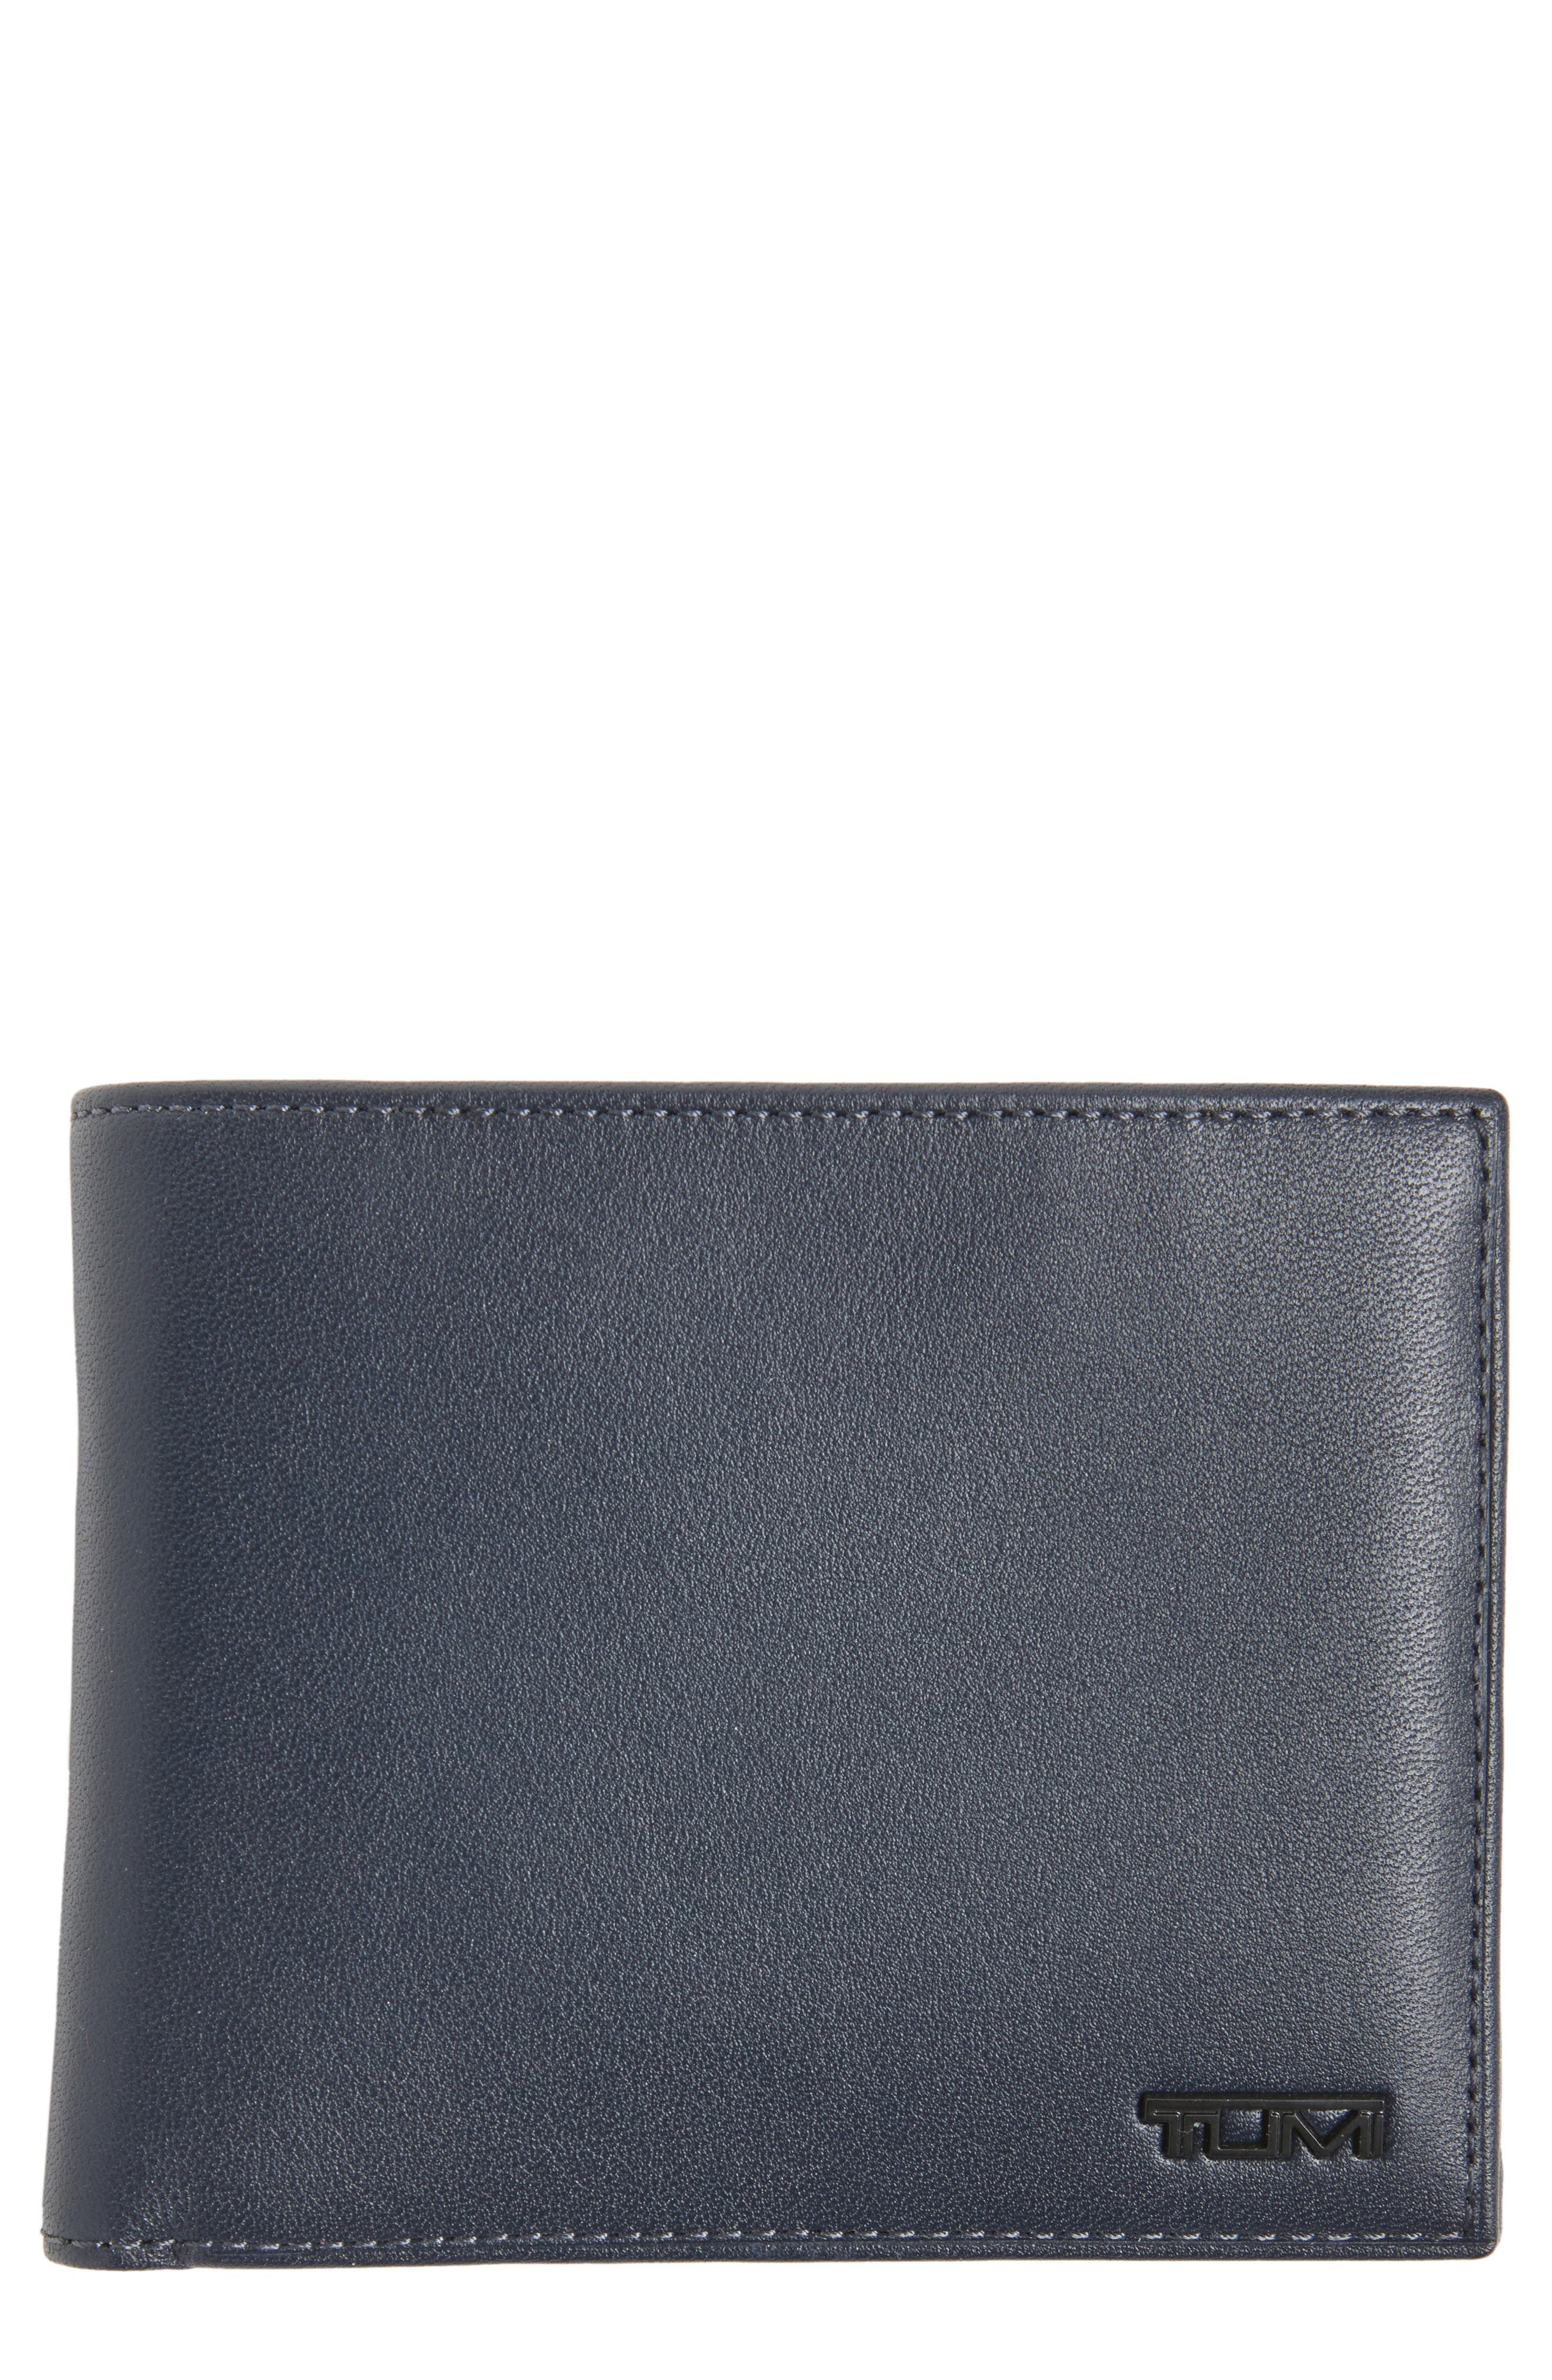 TUMI Delta Passcase ID Wallet